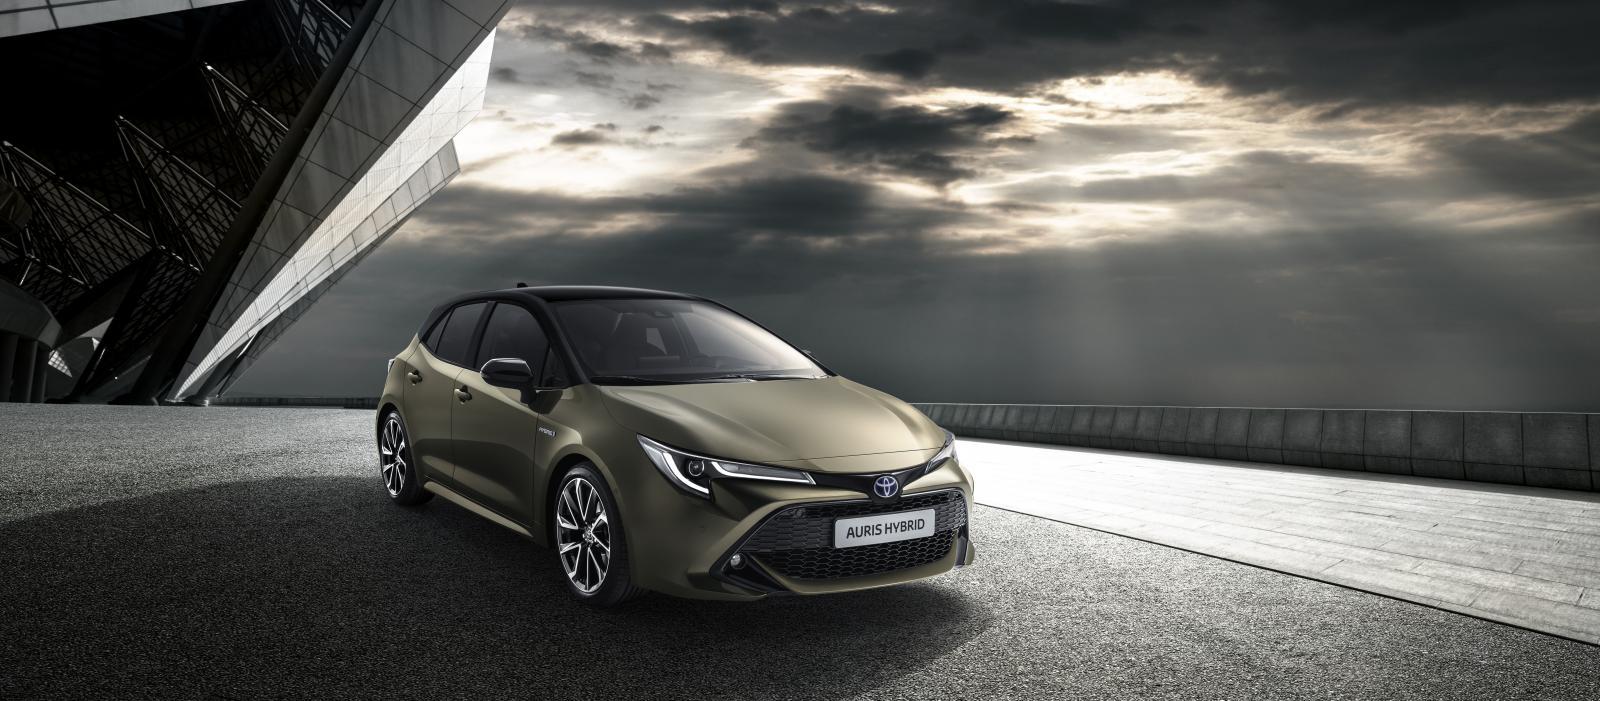 Nya Auris med fokus på hybridmotorer